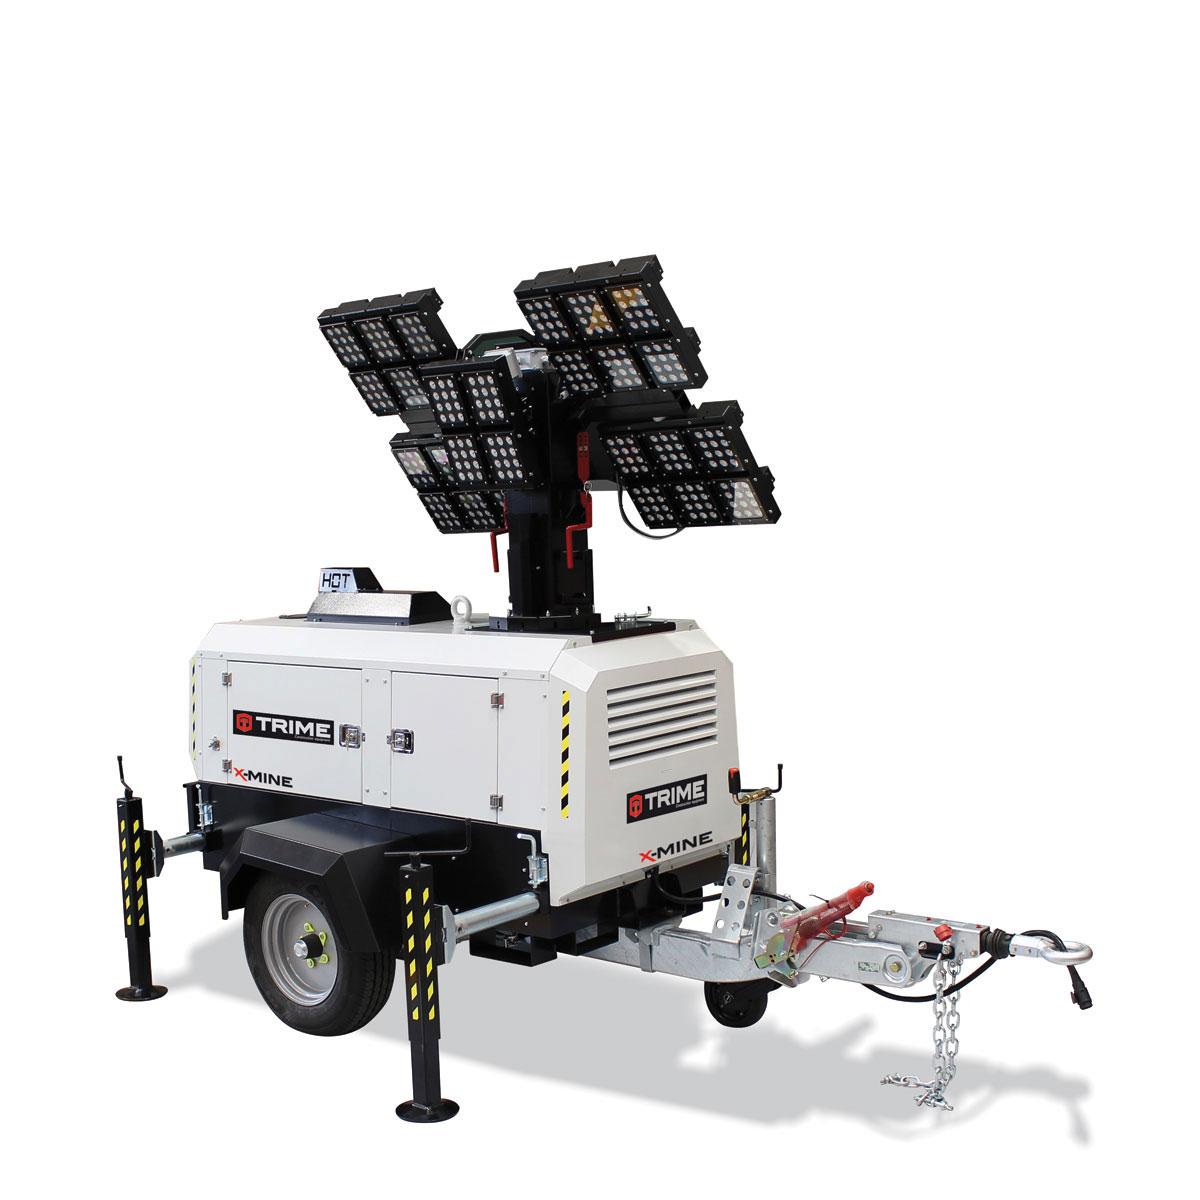 belysningsmast-LED-x-mine-28x150W-48V-stangd